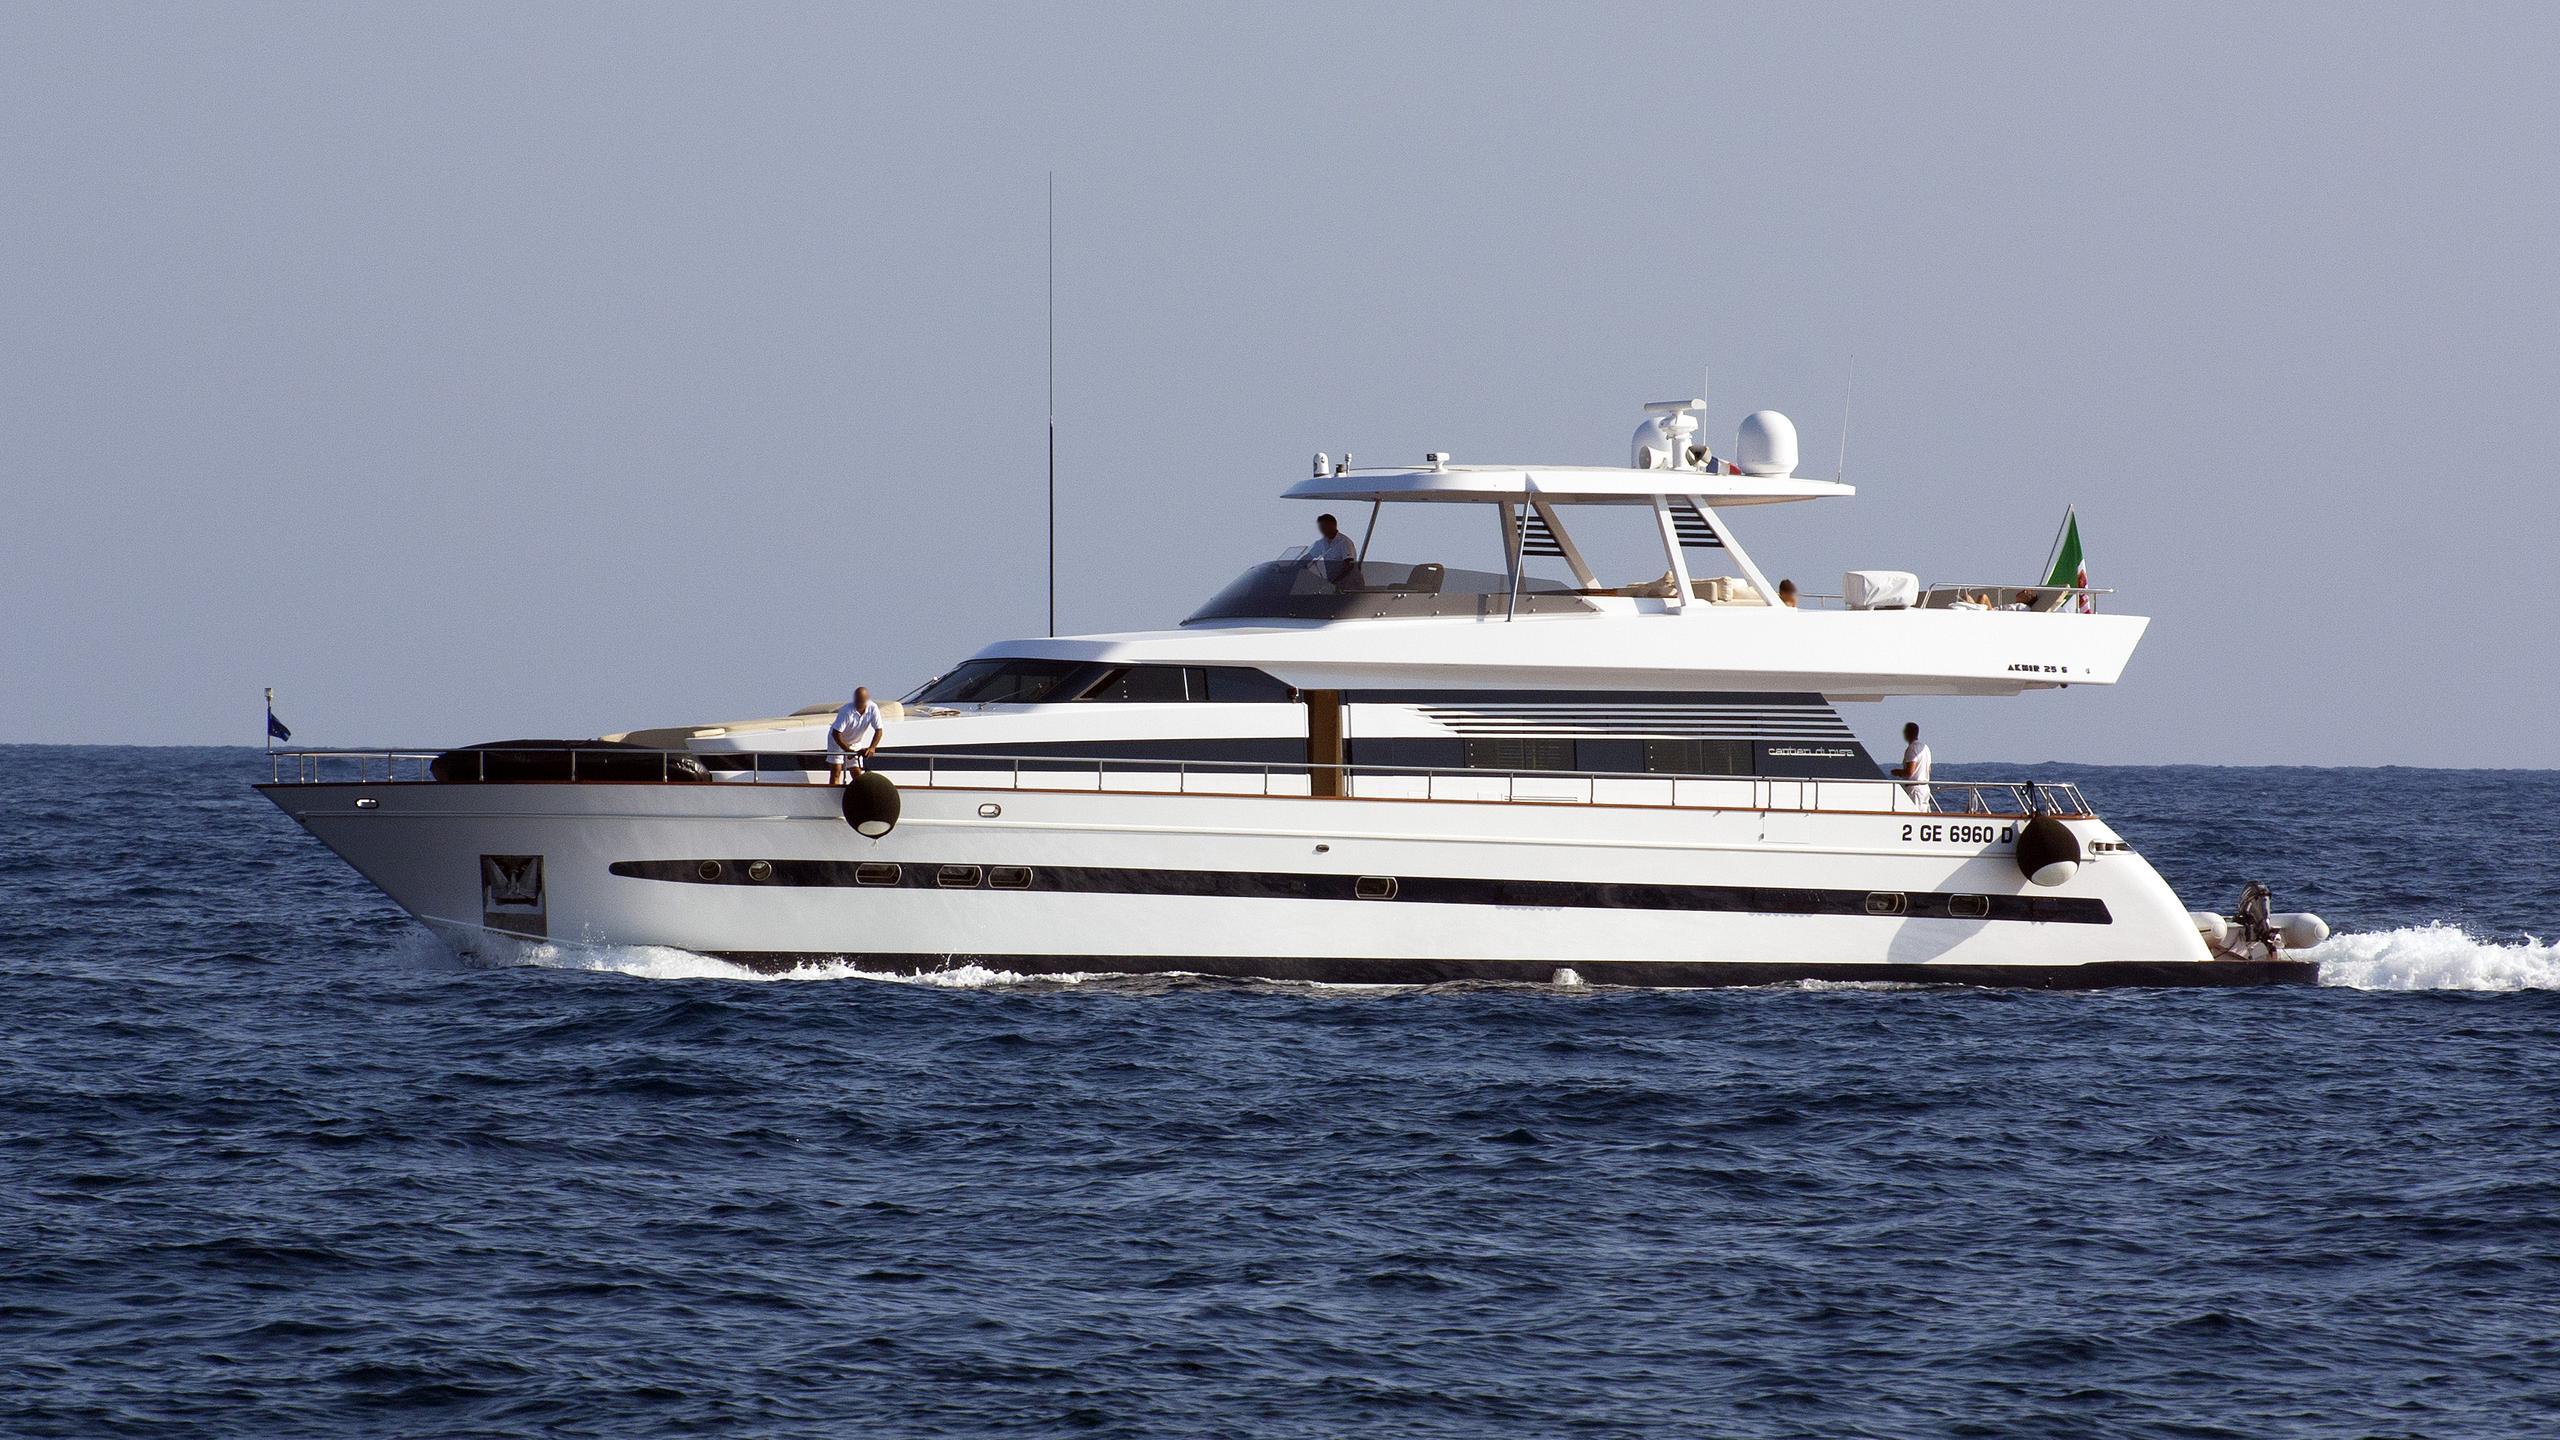 fawn-motor-yacht-cantieri-di-pisa-Akhir-25S-1990-26m-cruising